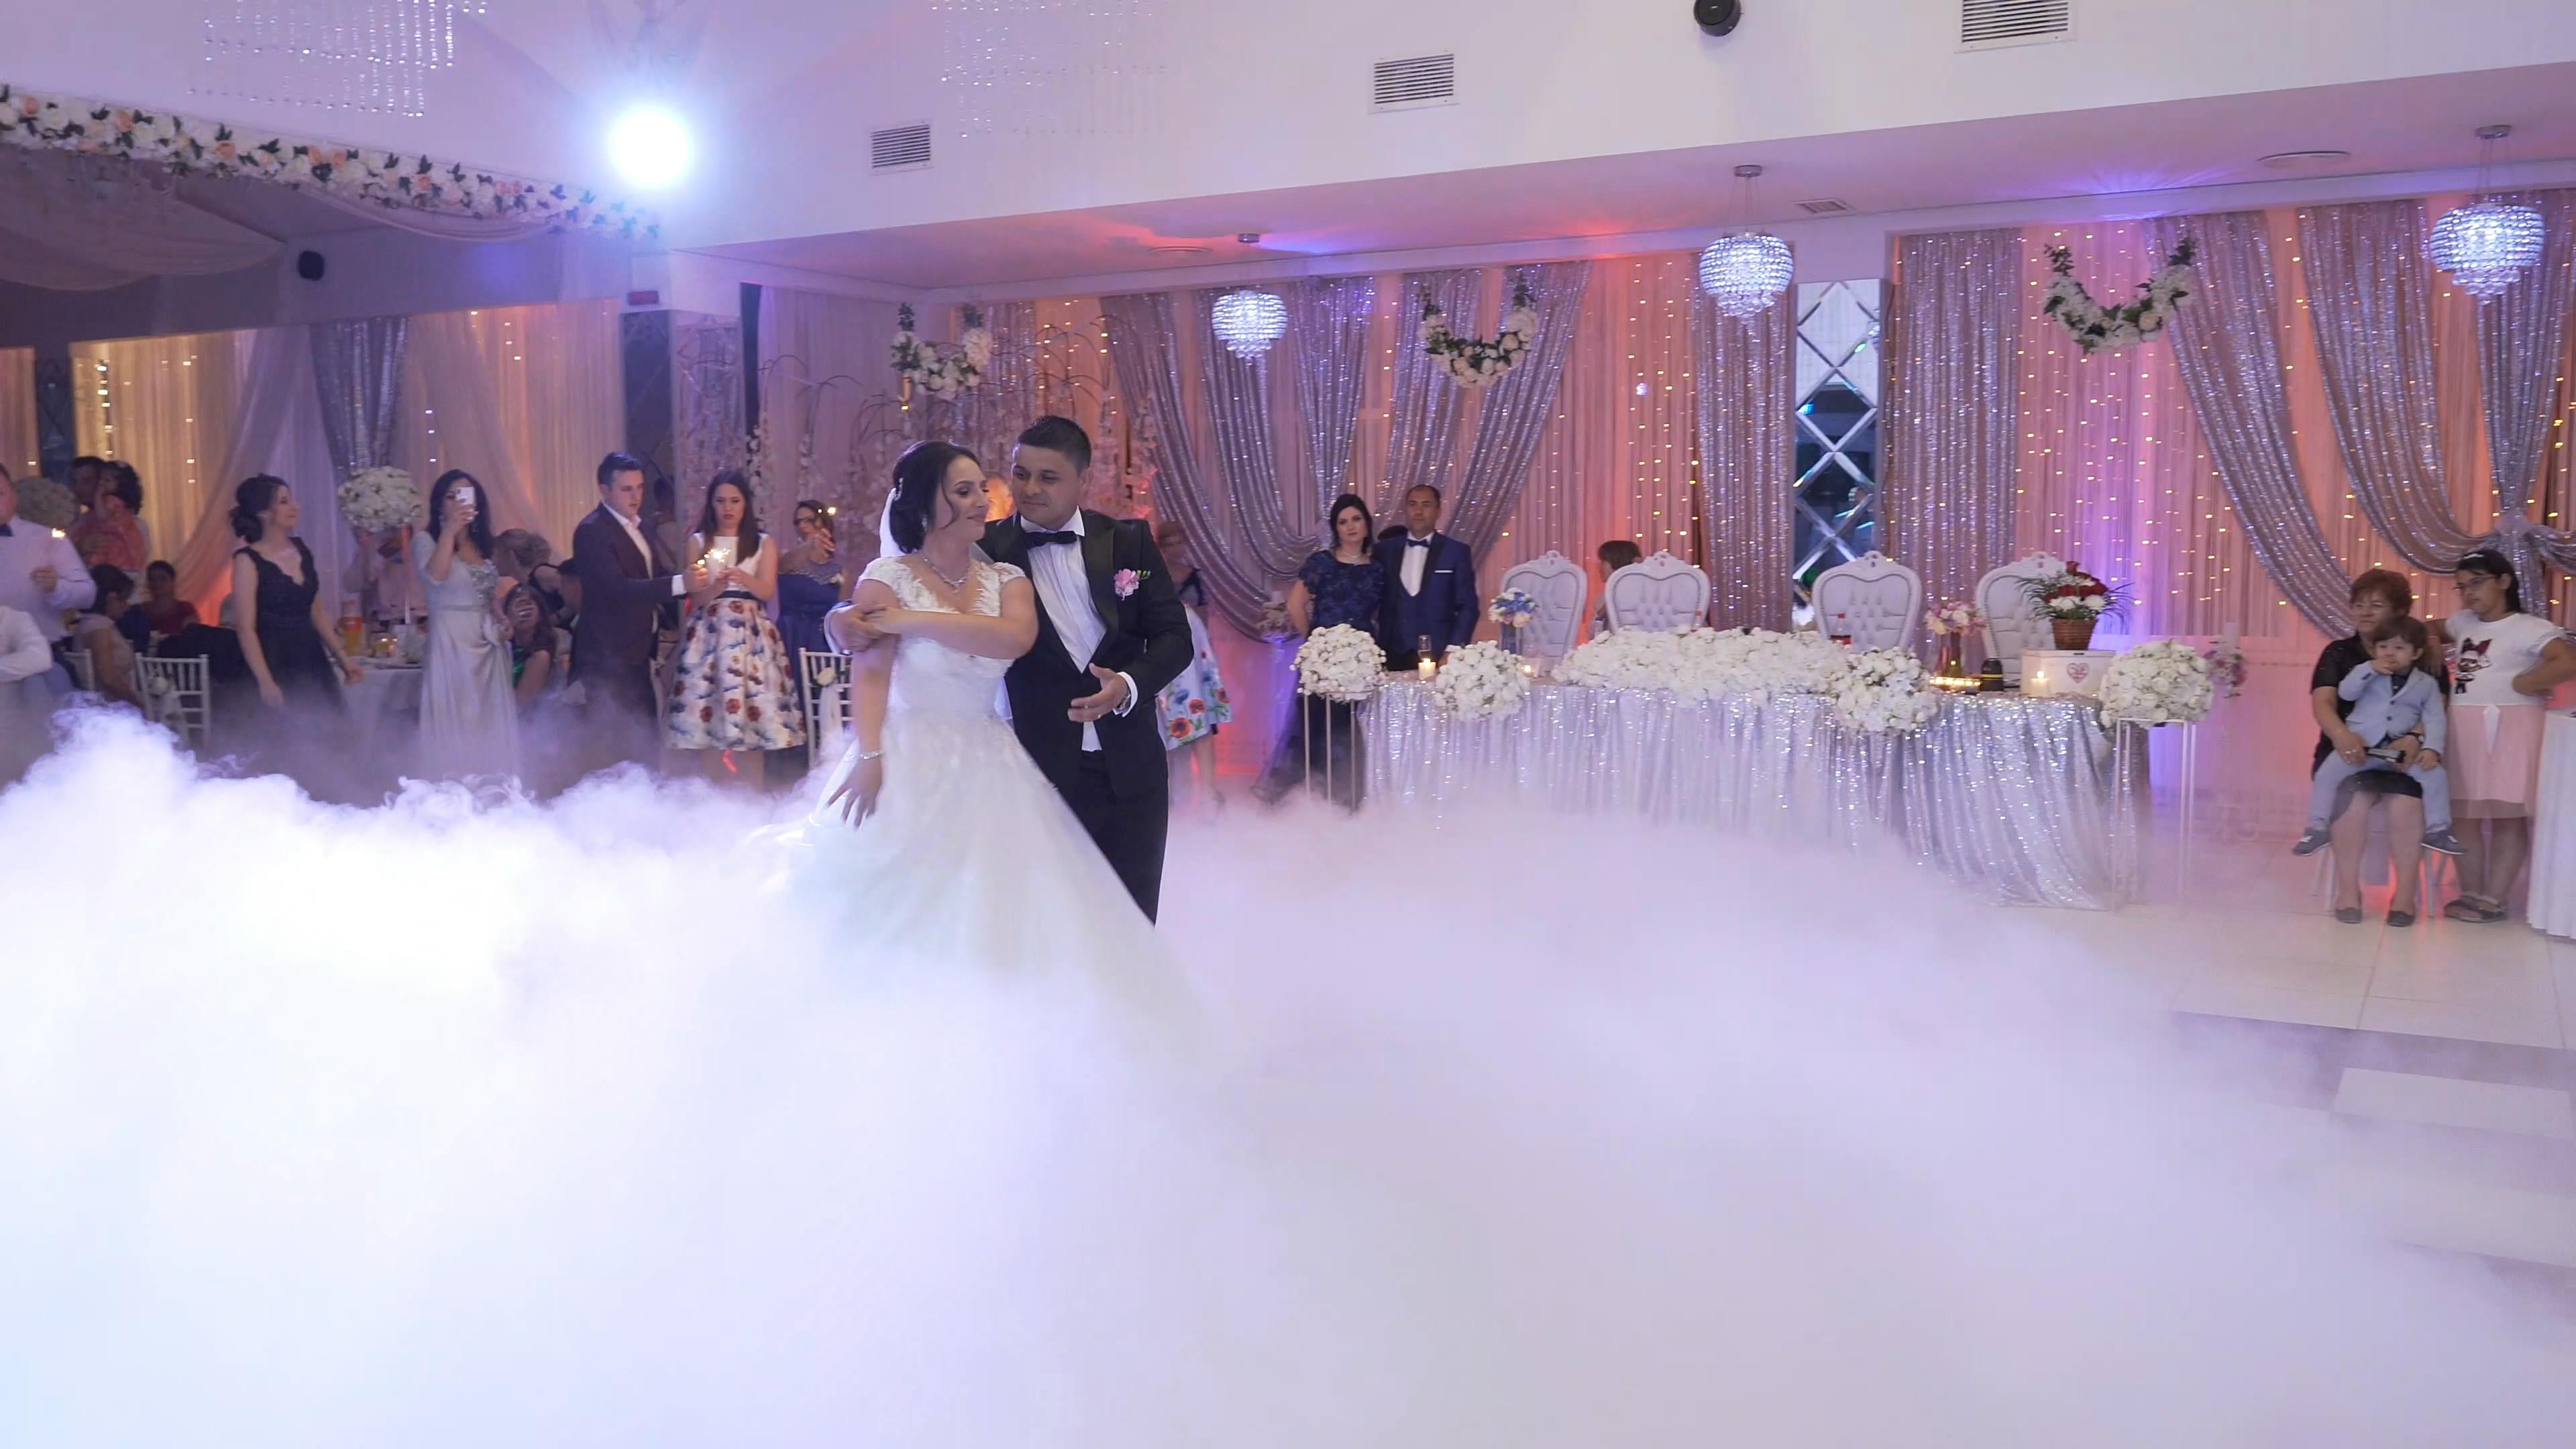 Madalina & Bogdan – Dansul mirilor 4k.mp4_snapshot_00.31_[2019.08.01_12.43.00]